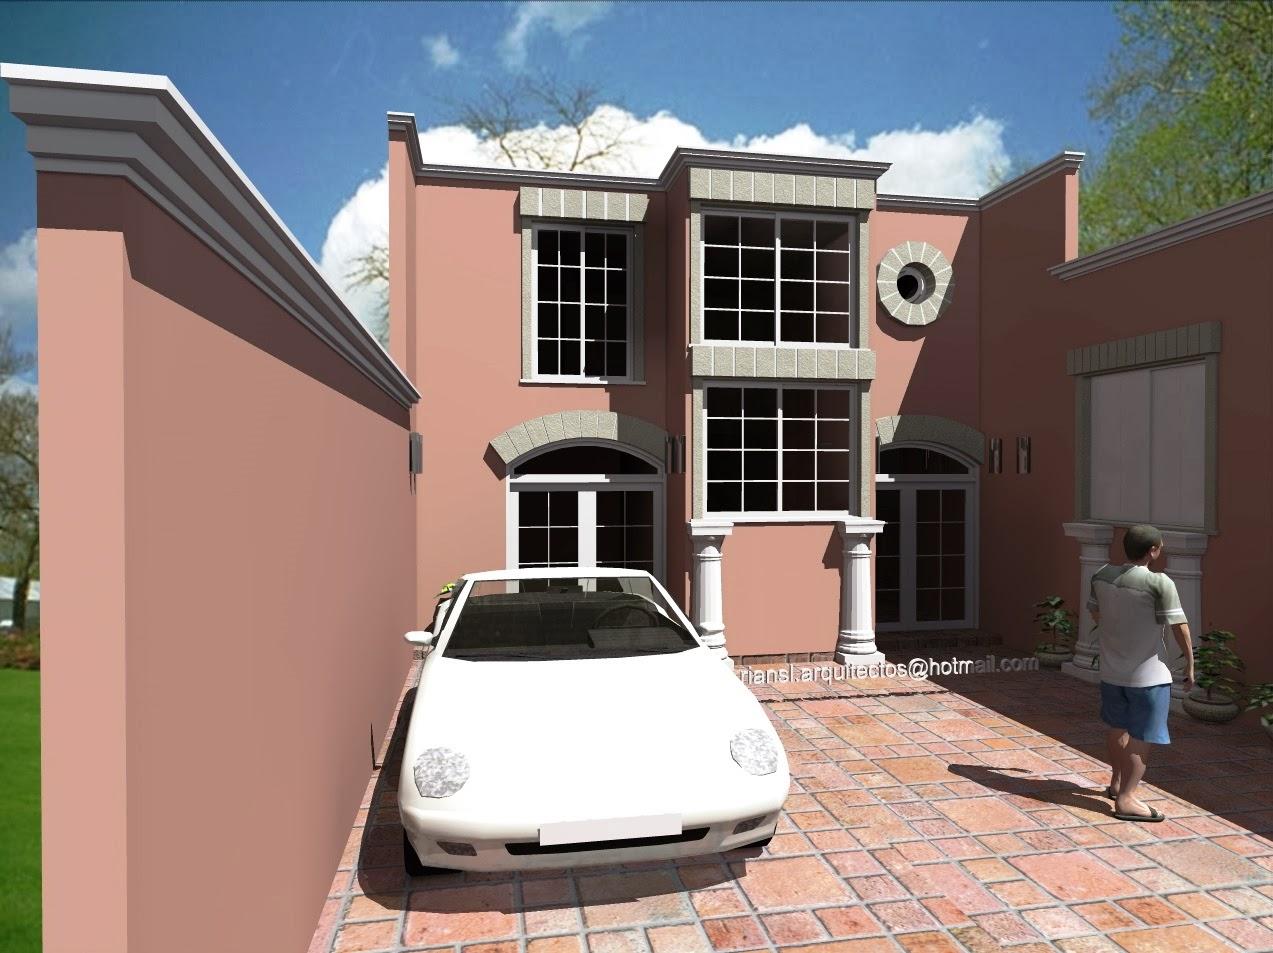 Proyectos virtuales dise o de casa habitaci n en 3d arq - Proyecto de diseno de interiores ...